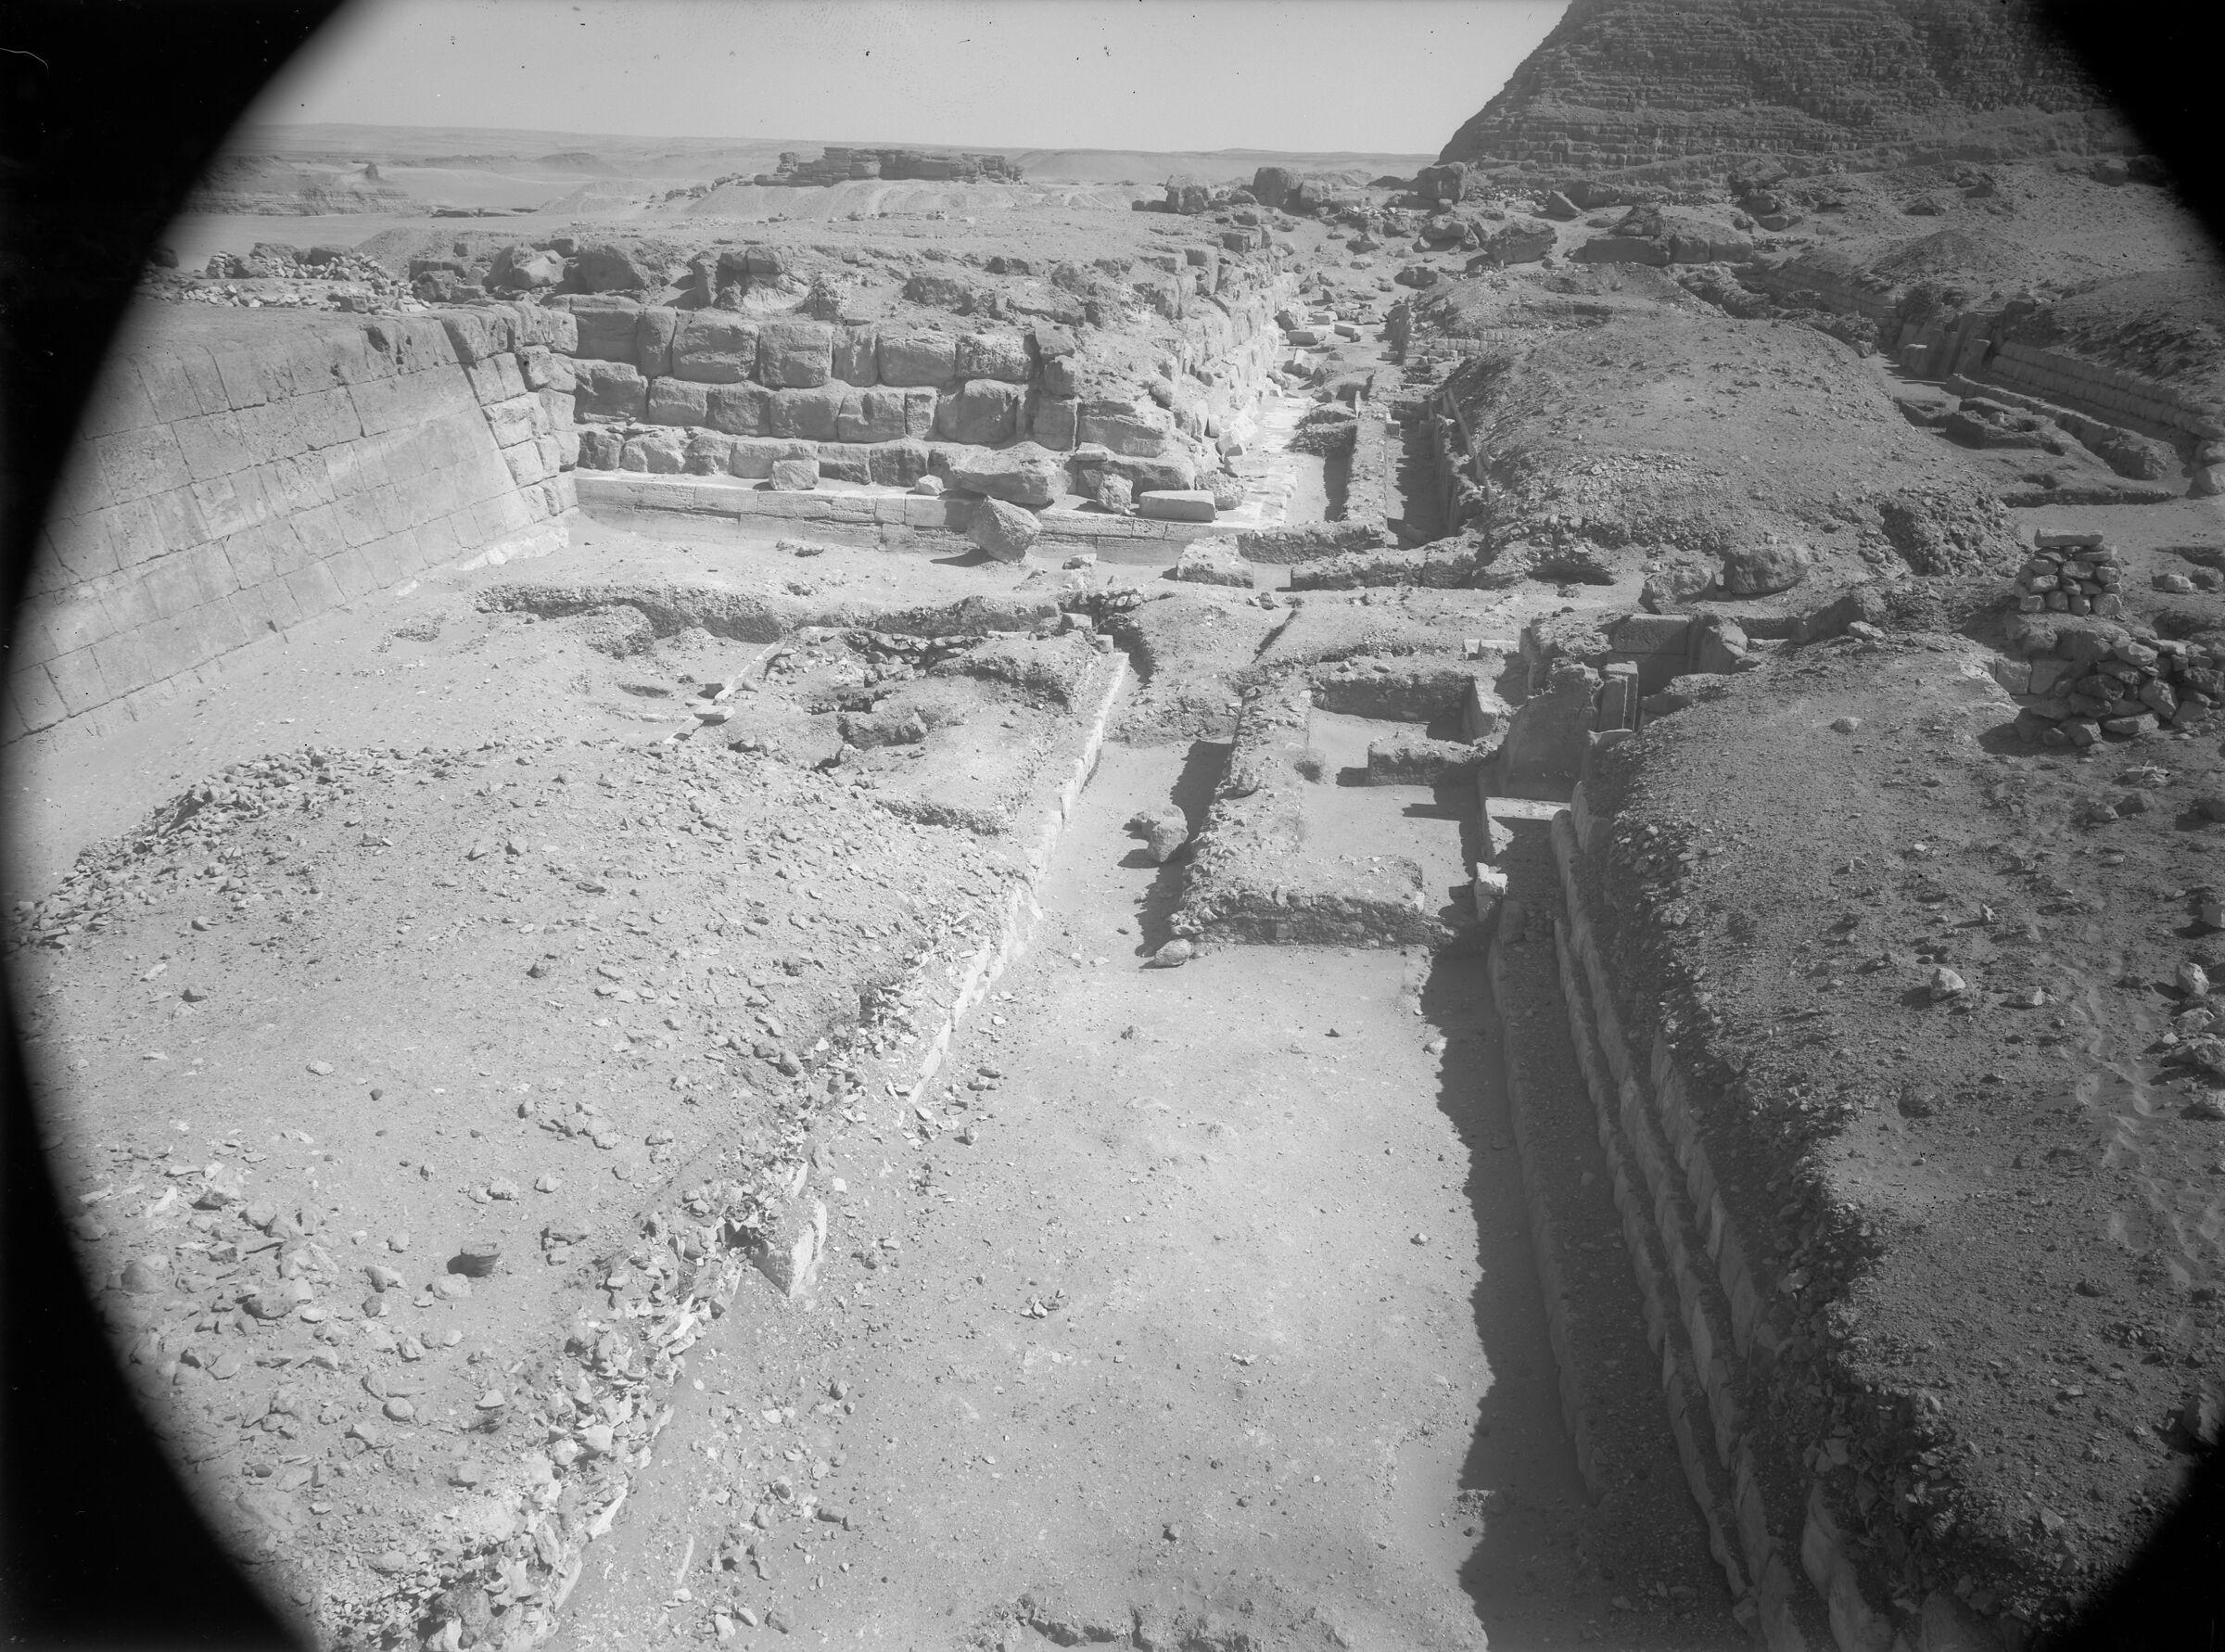 Western Cemetery: Site: Giza; View: G 5030, G 5020, G 5010, G 5130, G 5131